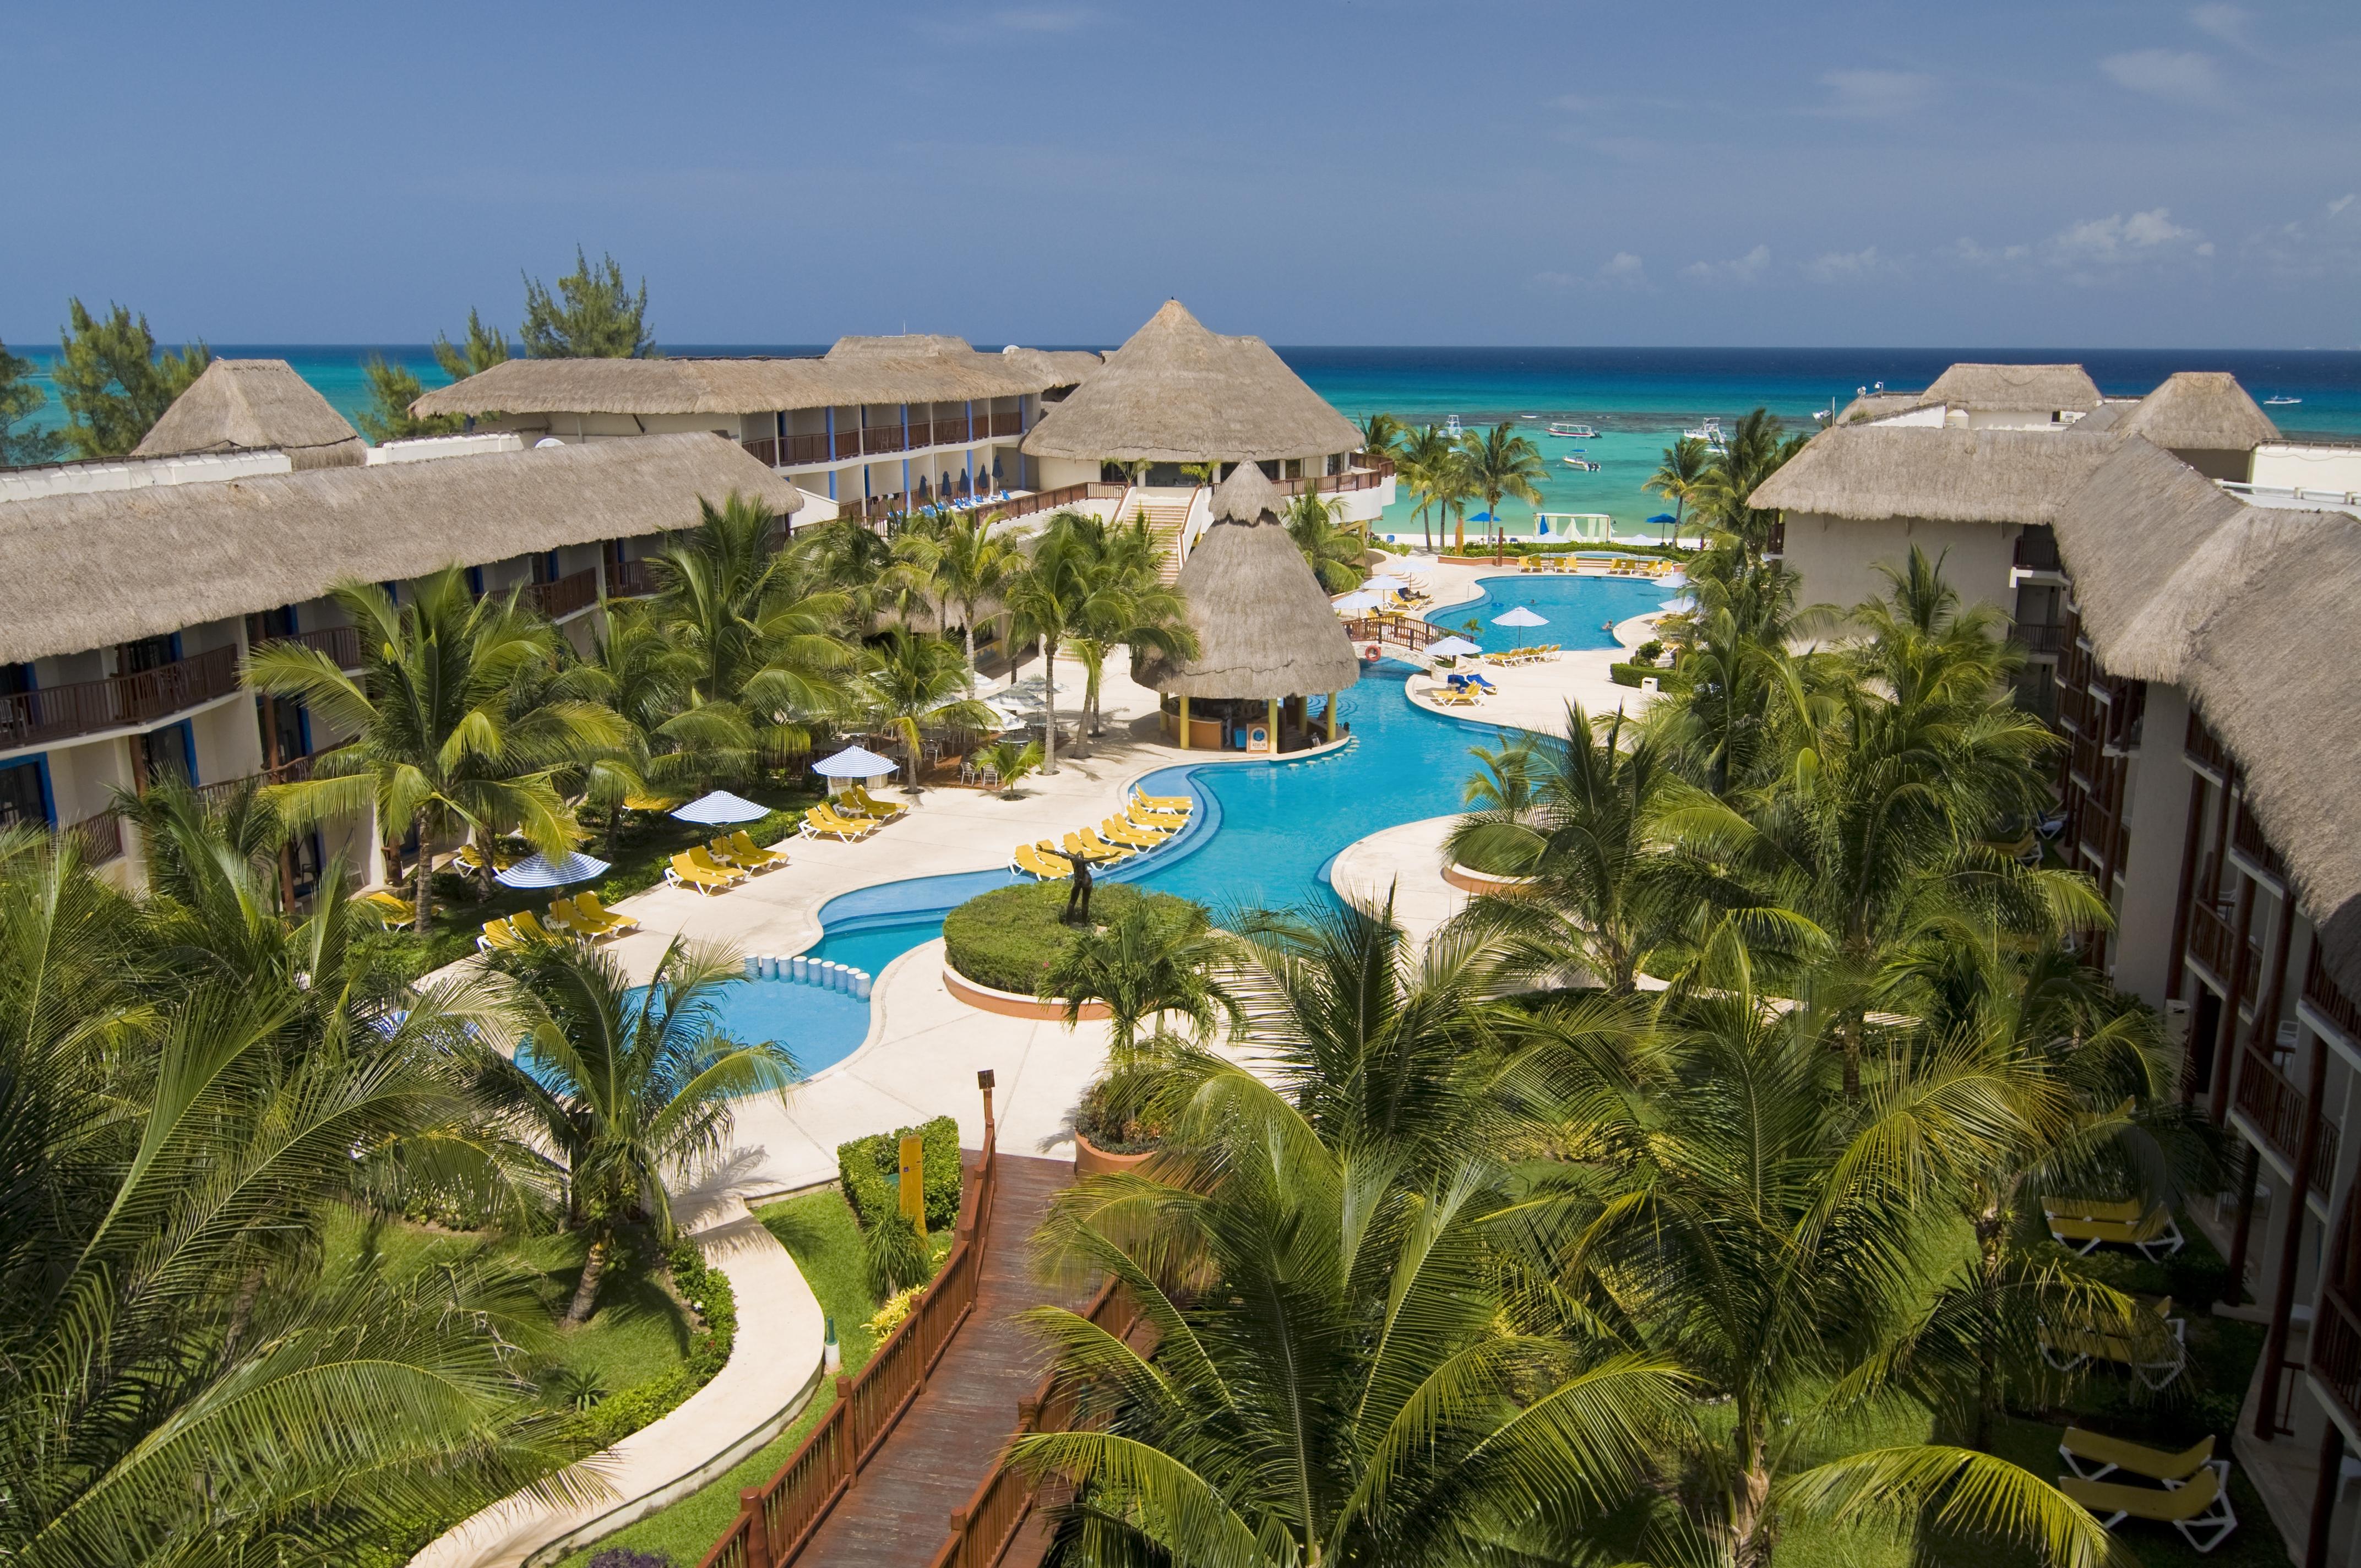 The Reef Coco Beach aerial view